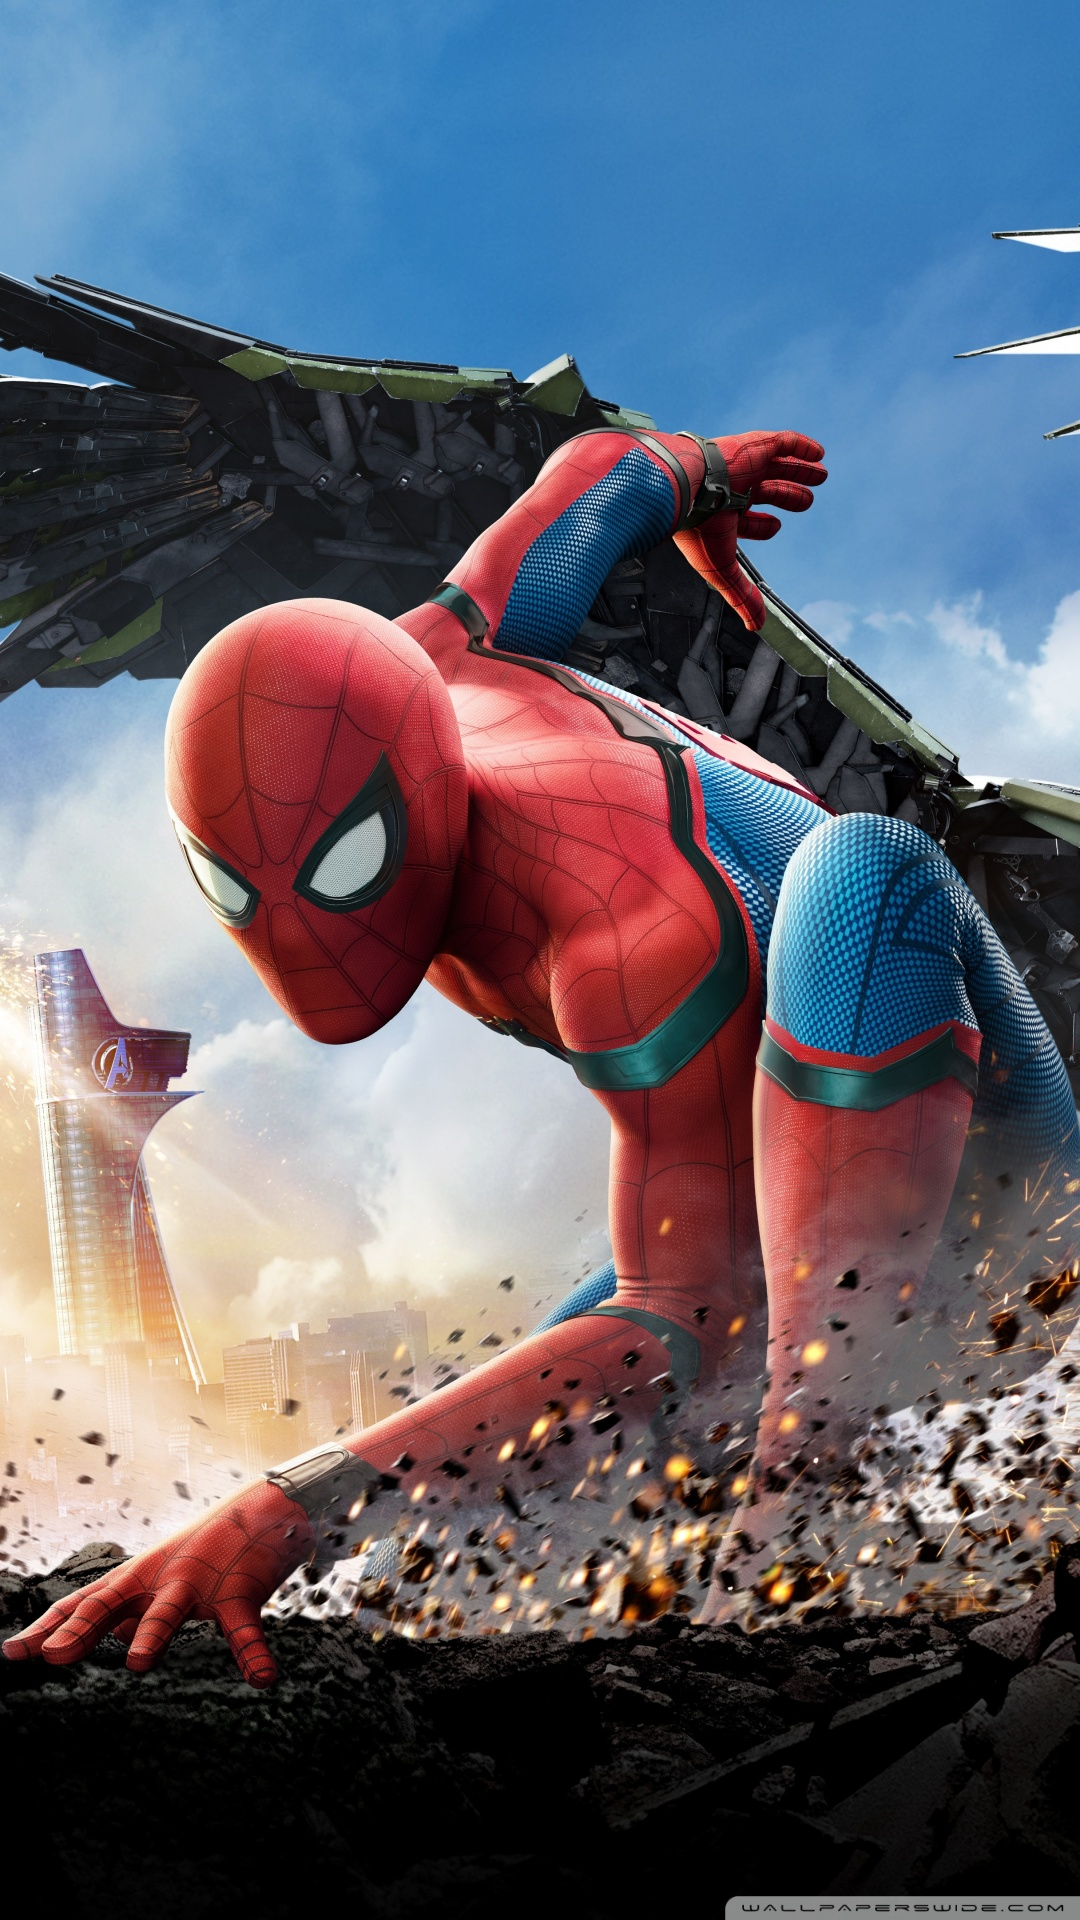 SPIDERMAN HOMECOMING 2017 4K HD Desktop Wallpaper for Wide 1080x1920